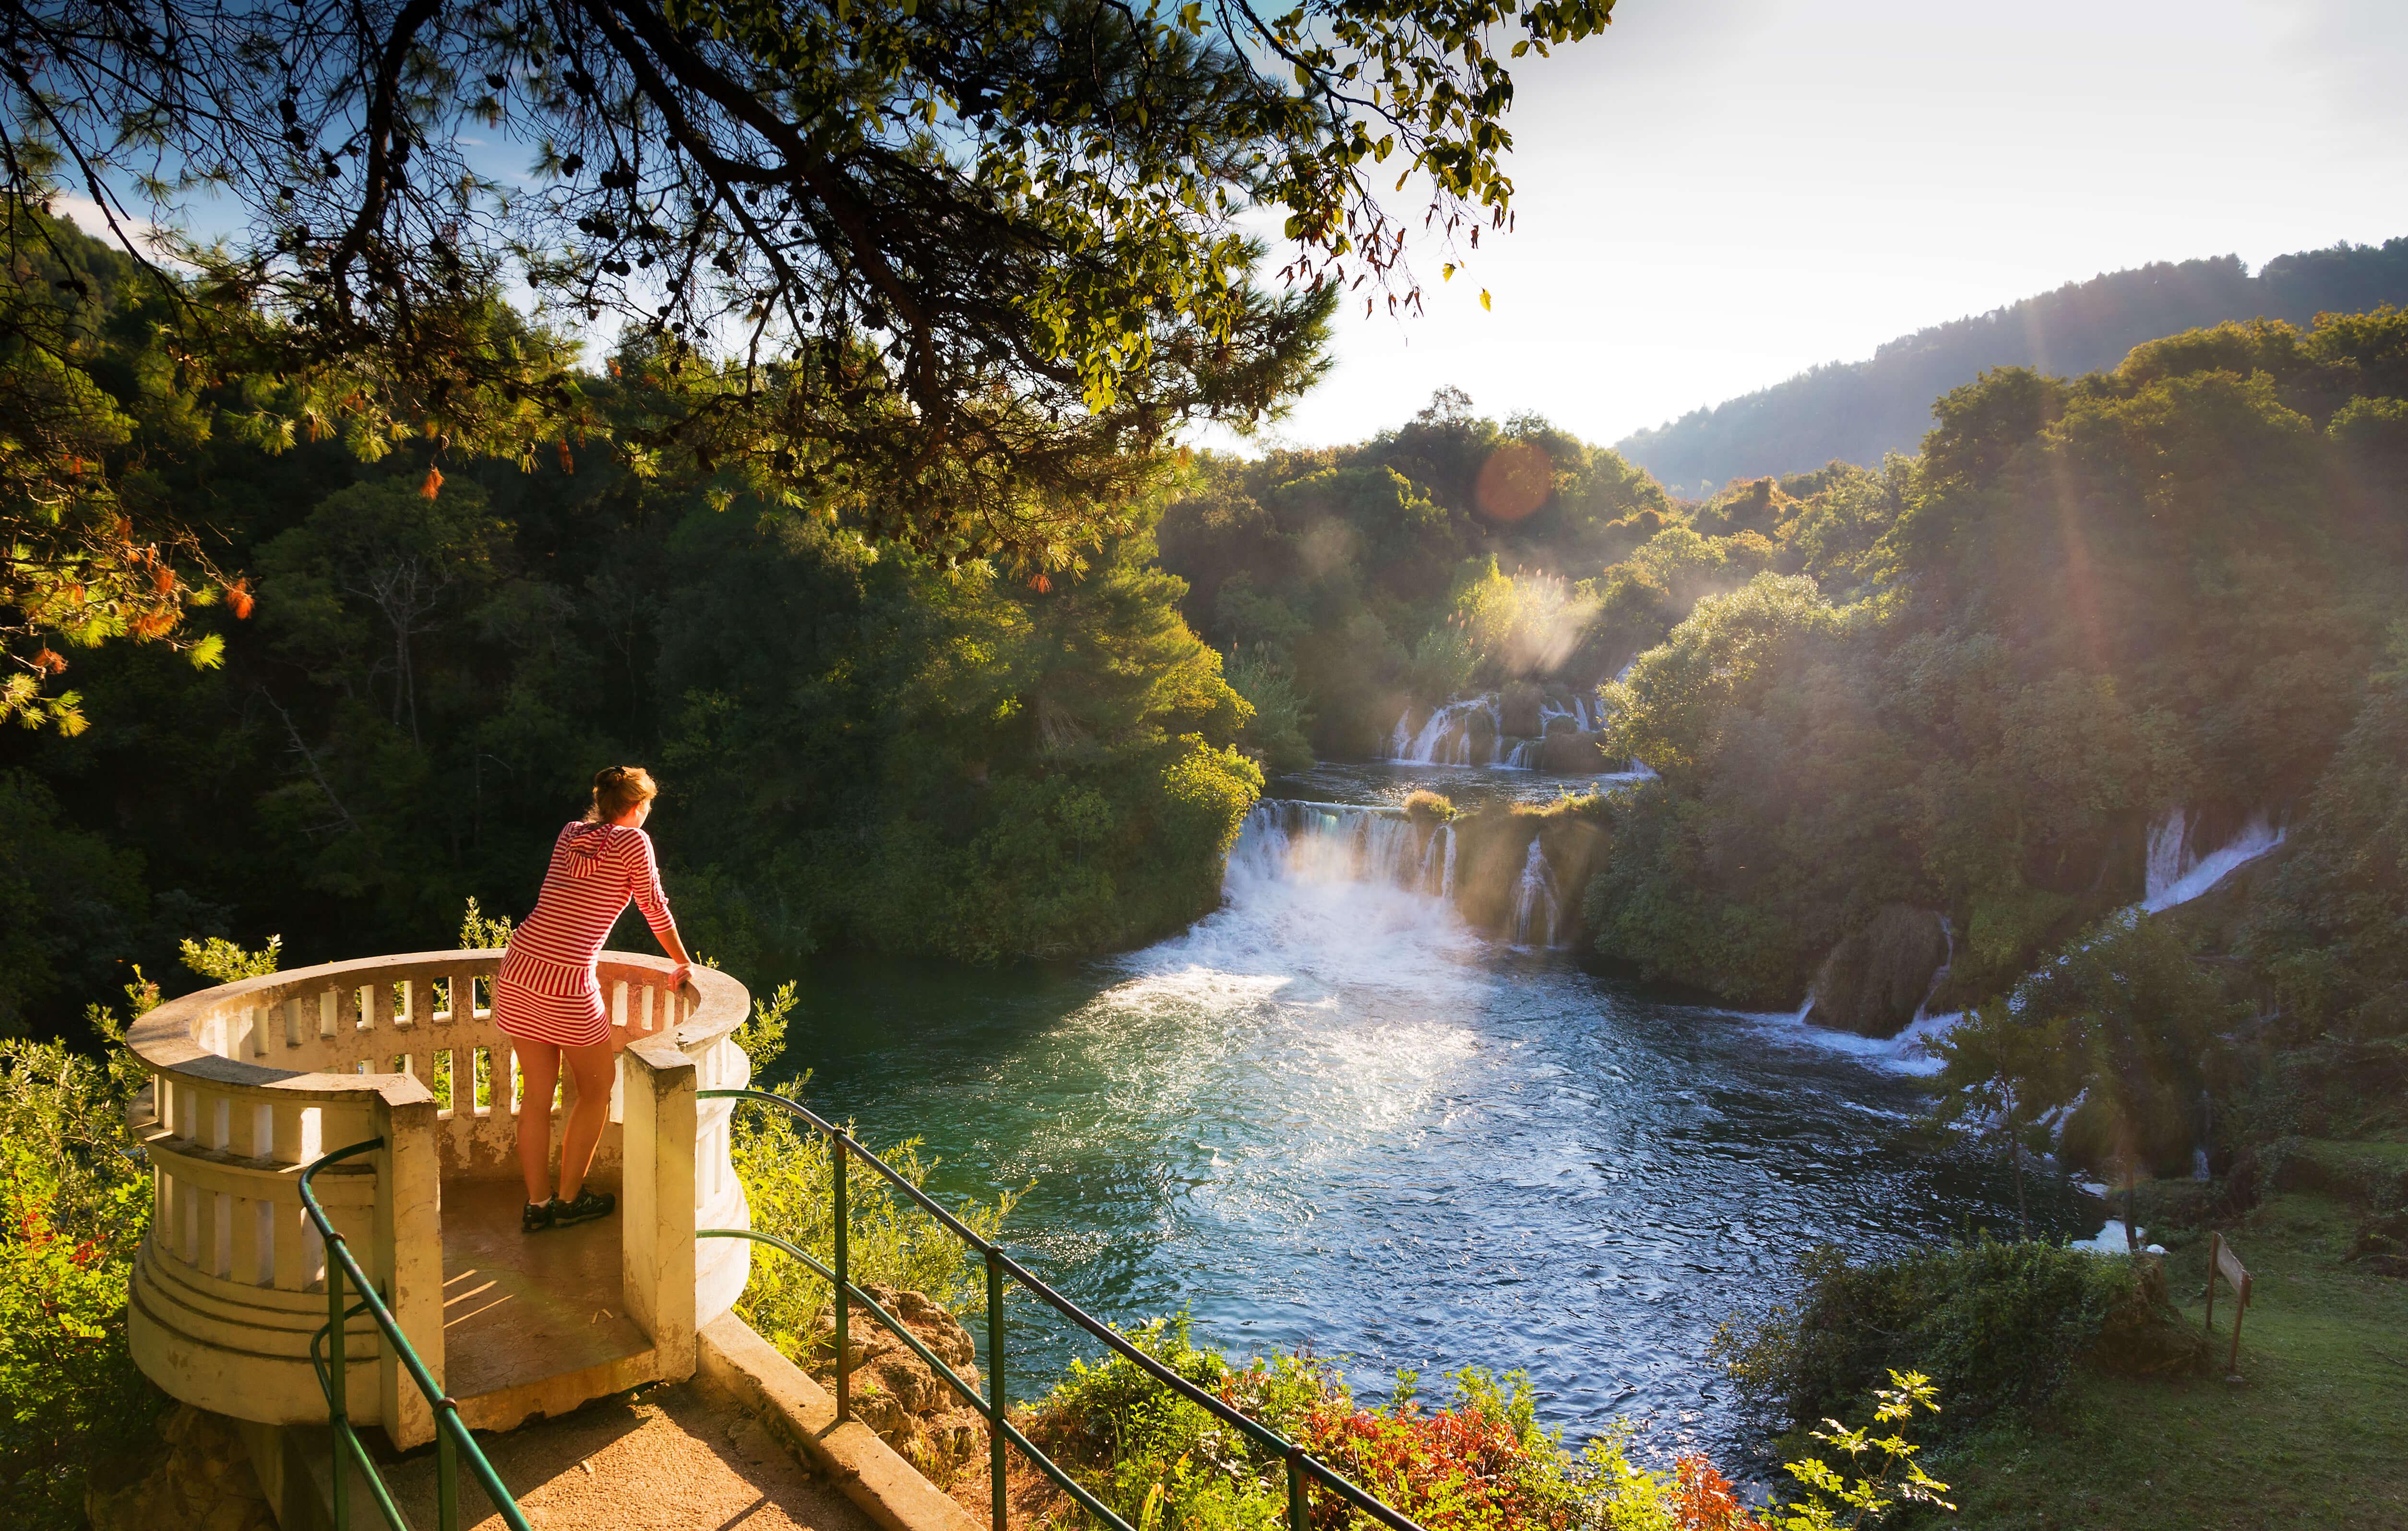 Croatia's stunning, naturally scenic Krka National Park.